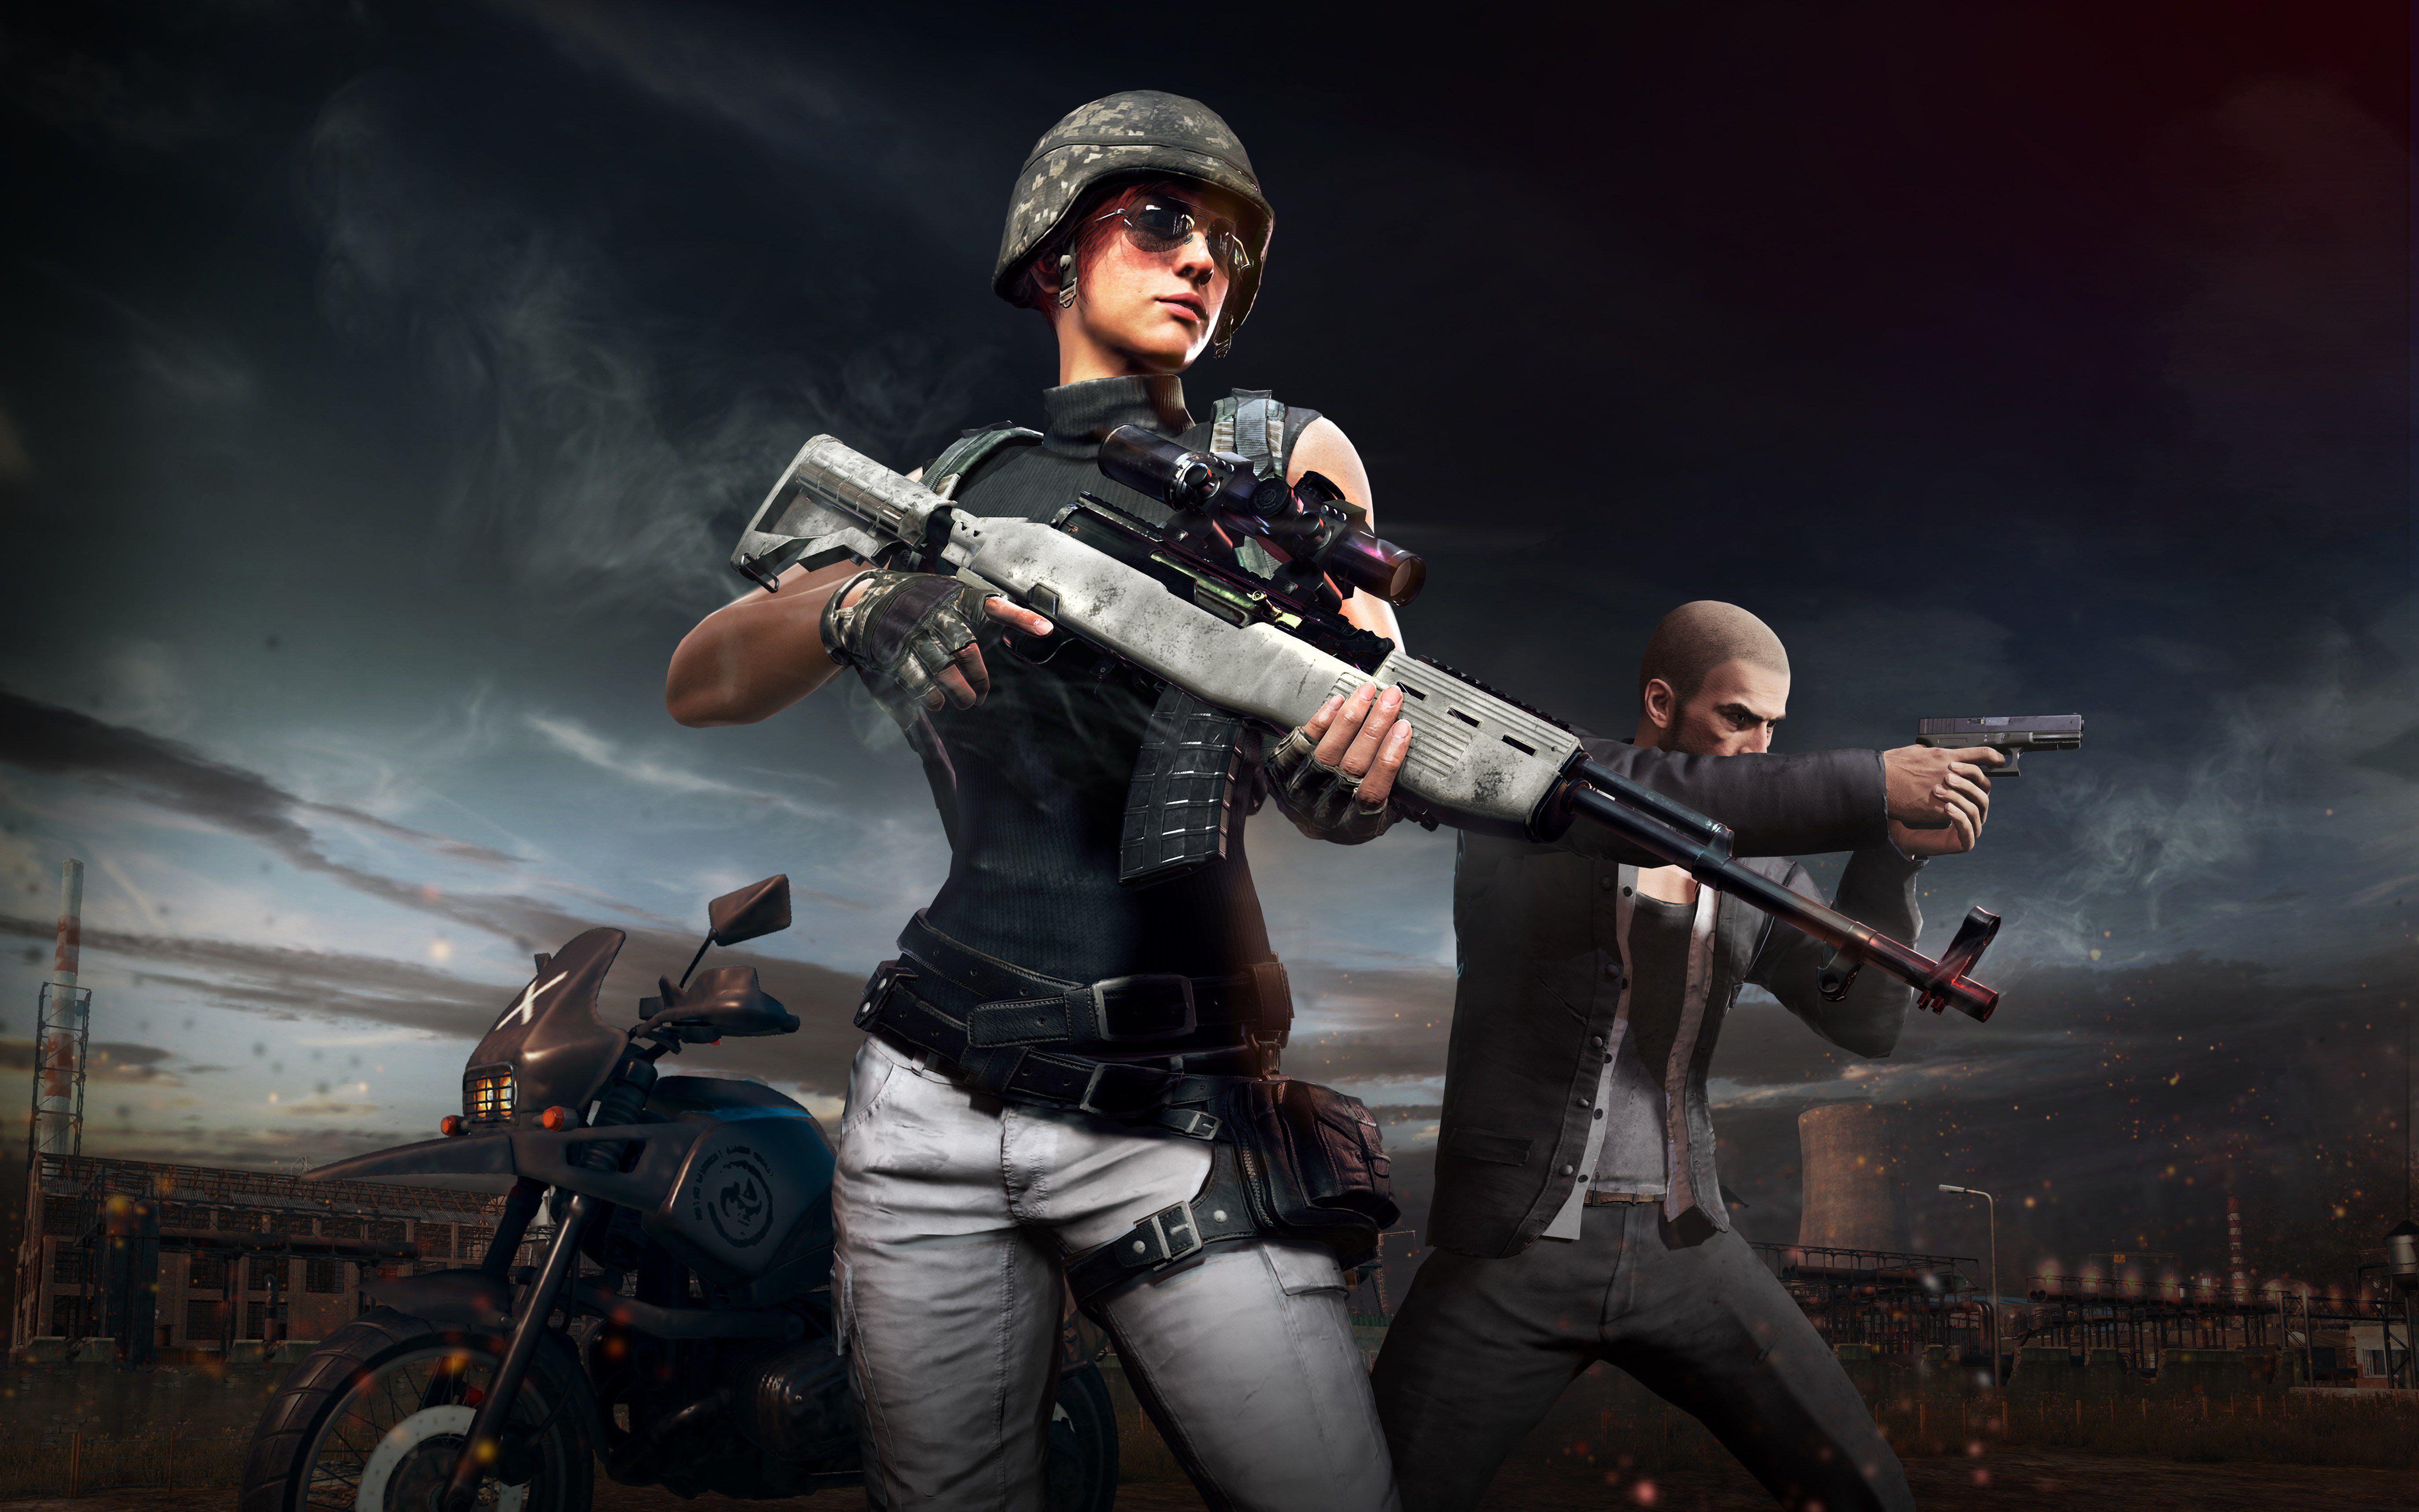 PlayerUnknowns Battlegrounds PUBG Wallpapers and Photos 5500x3438